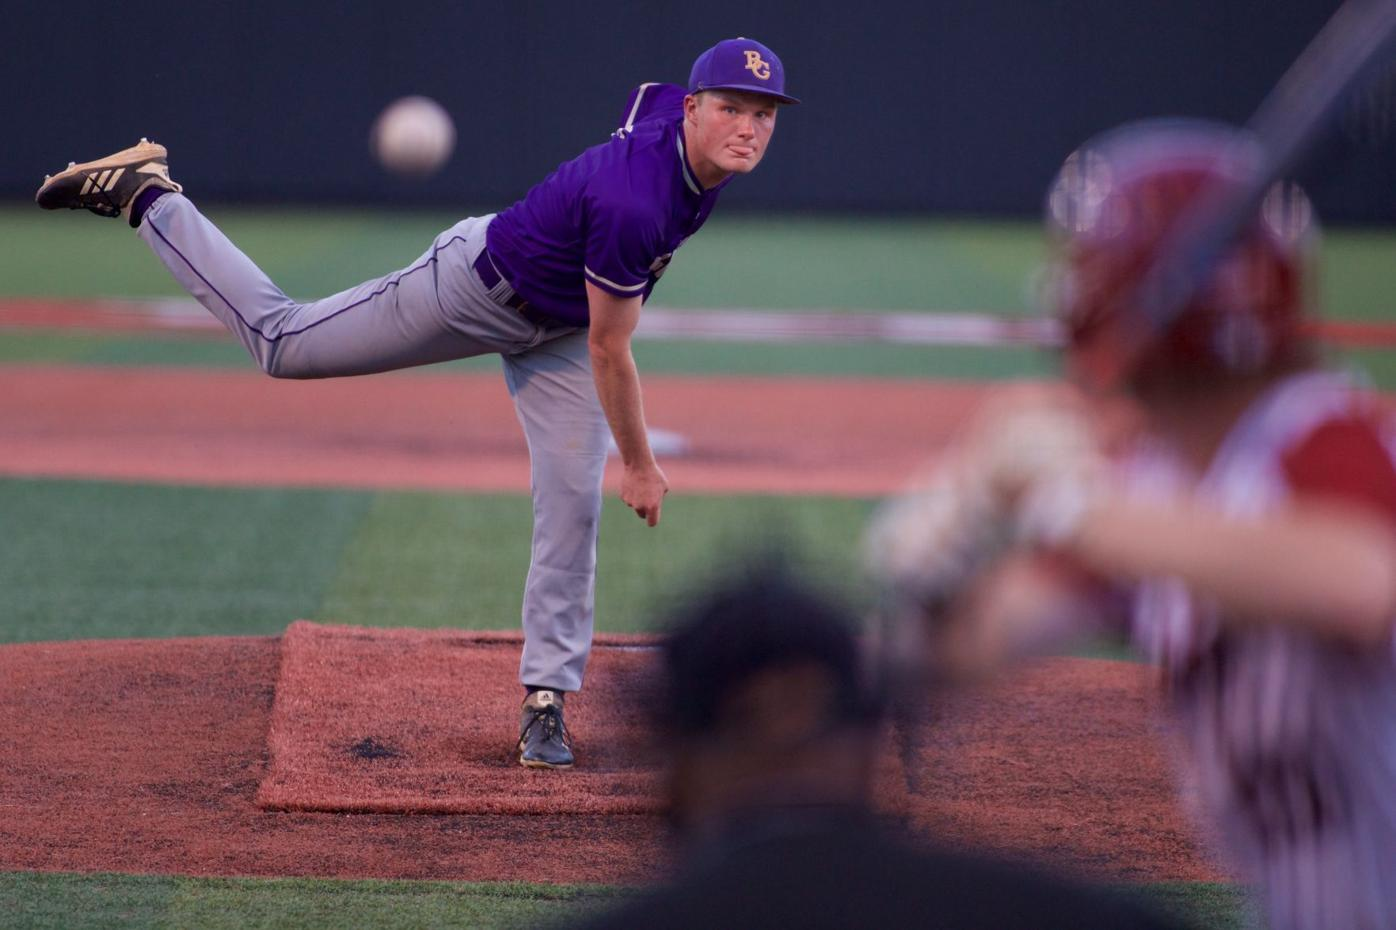 210612-sports-BG vs  McCracken County KHSAA state baseball tourn_outbound 7.jpg